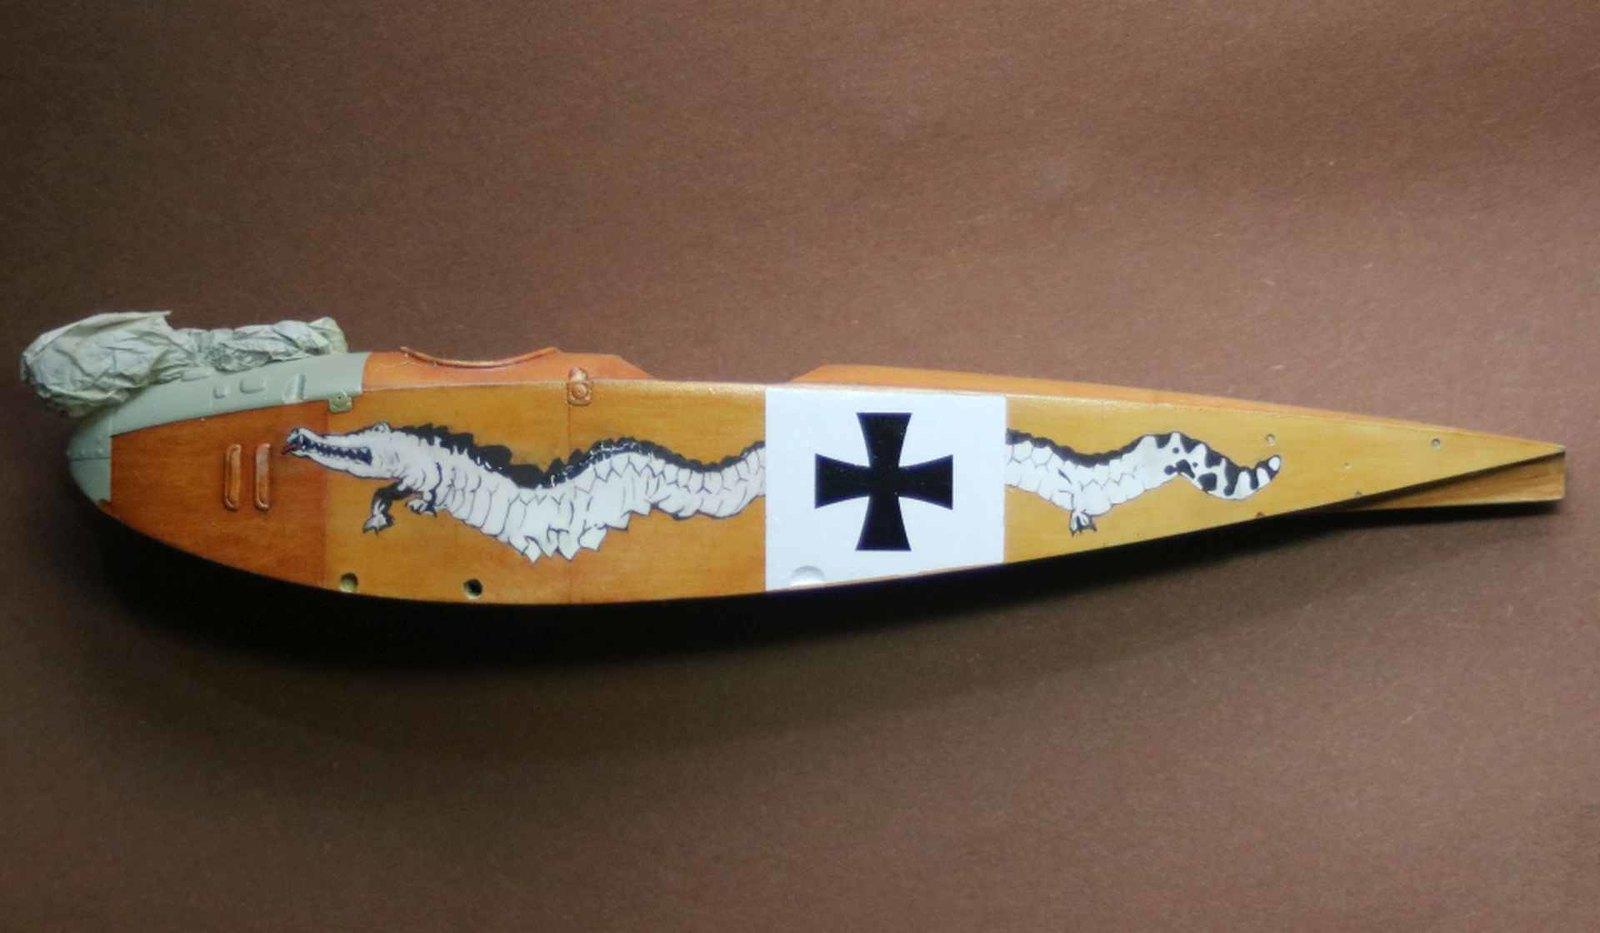 1/48 Albatros C. III - Page 4 44507481492_82056f7b18_h